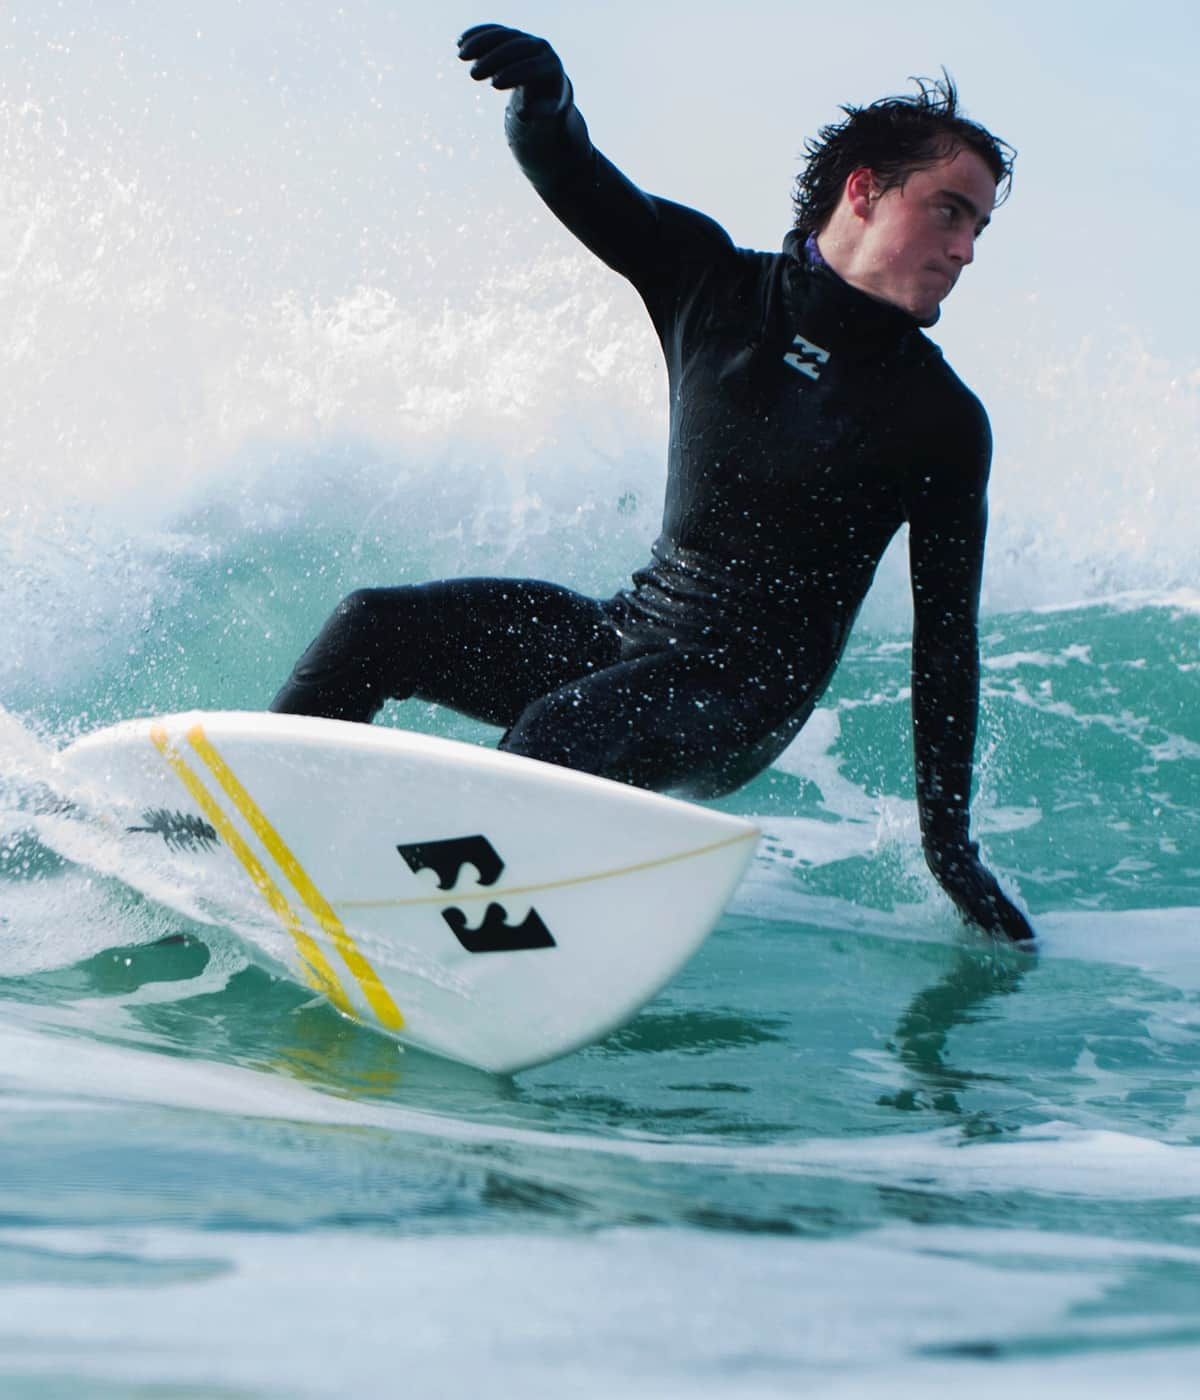 Surfing my way to Tokyo